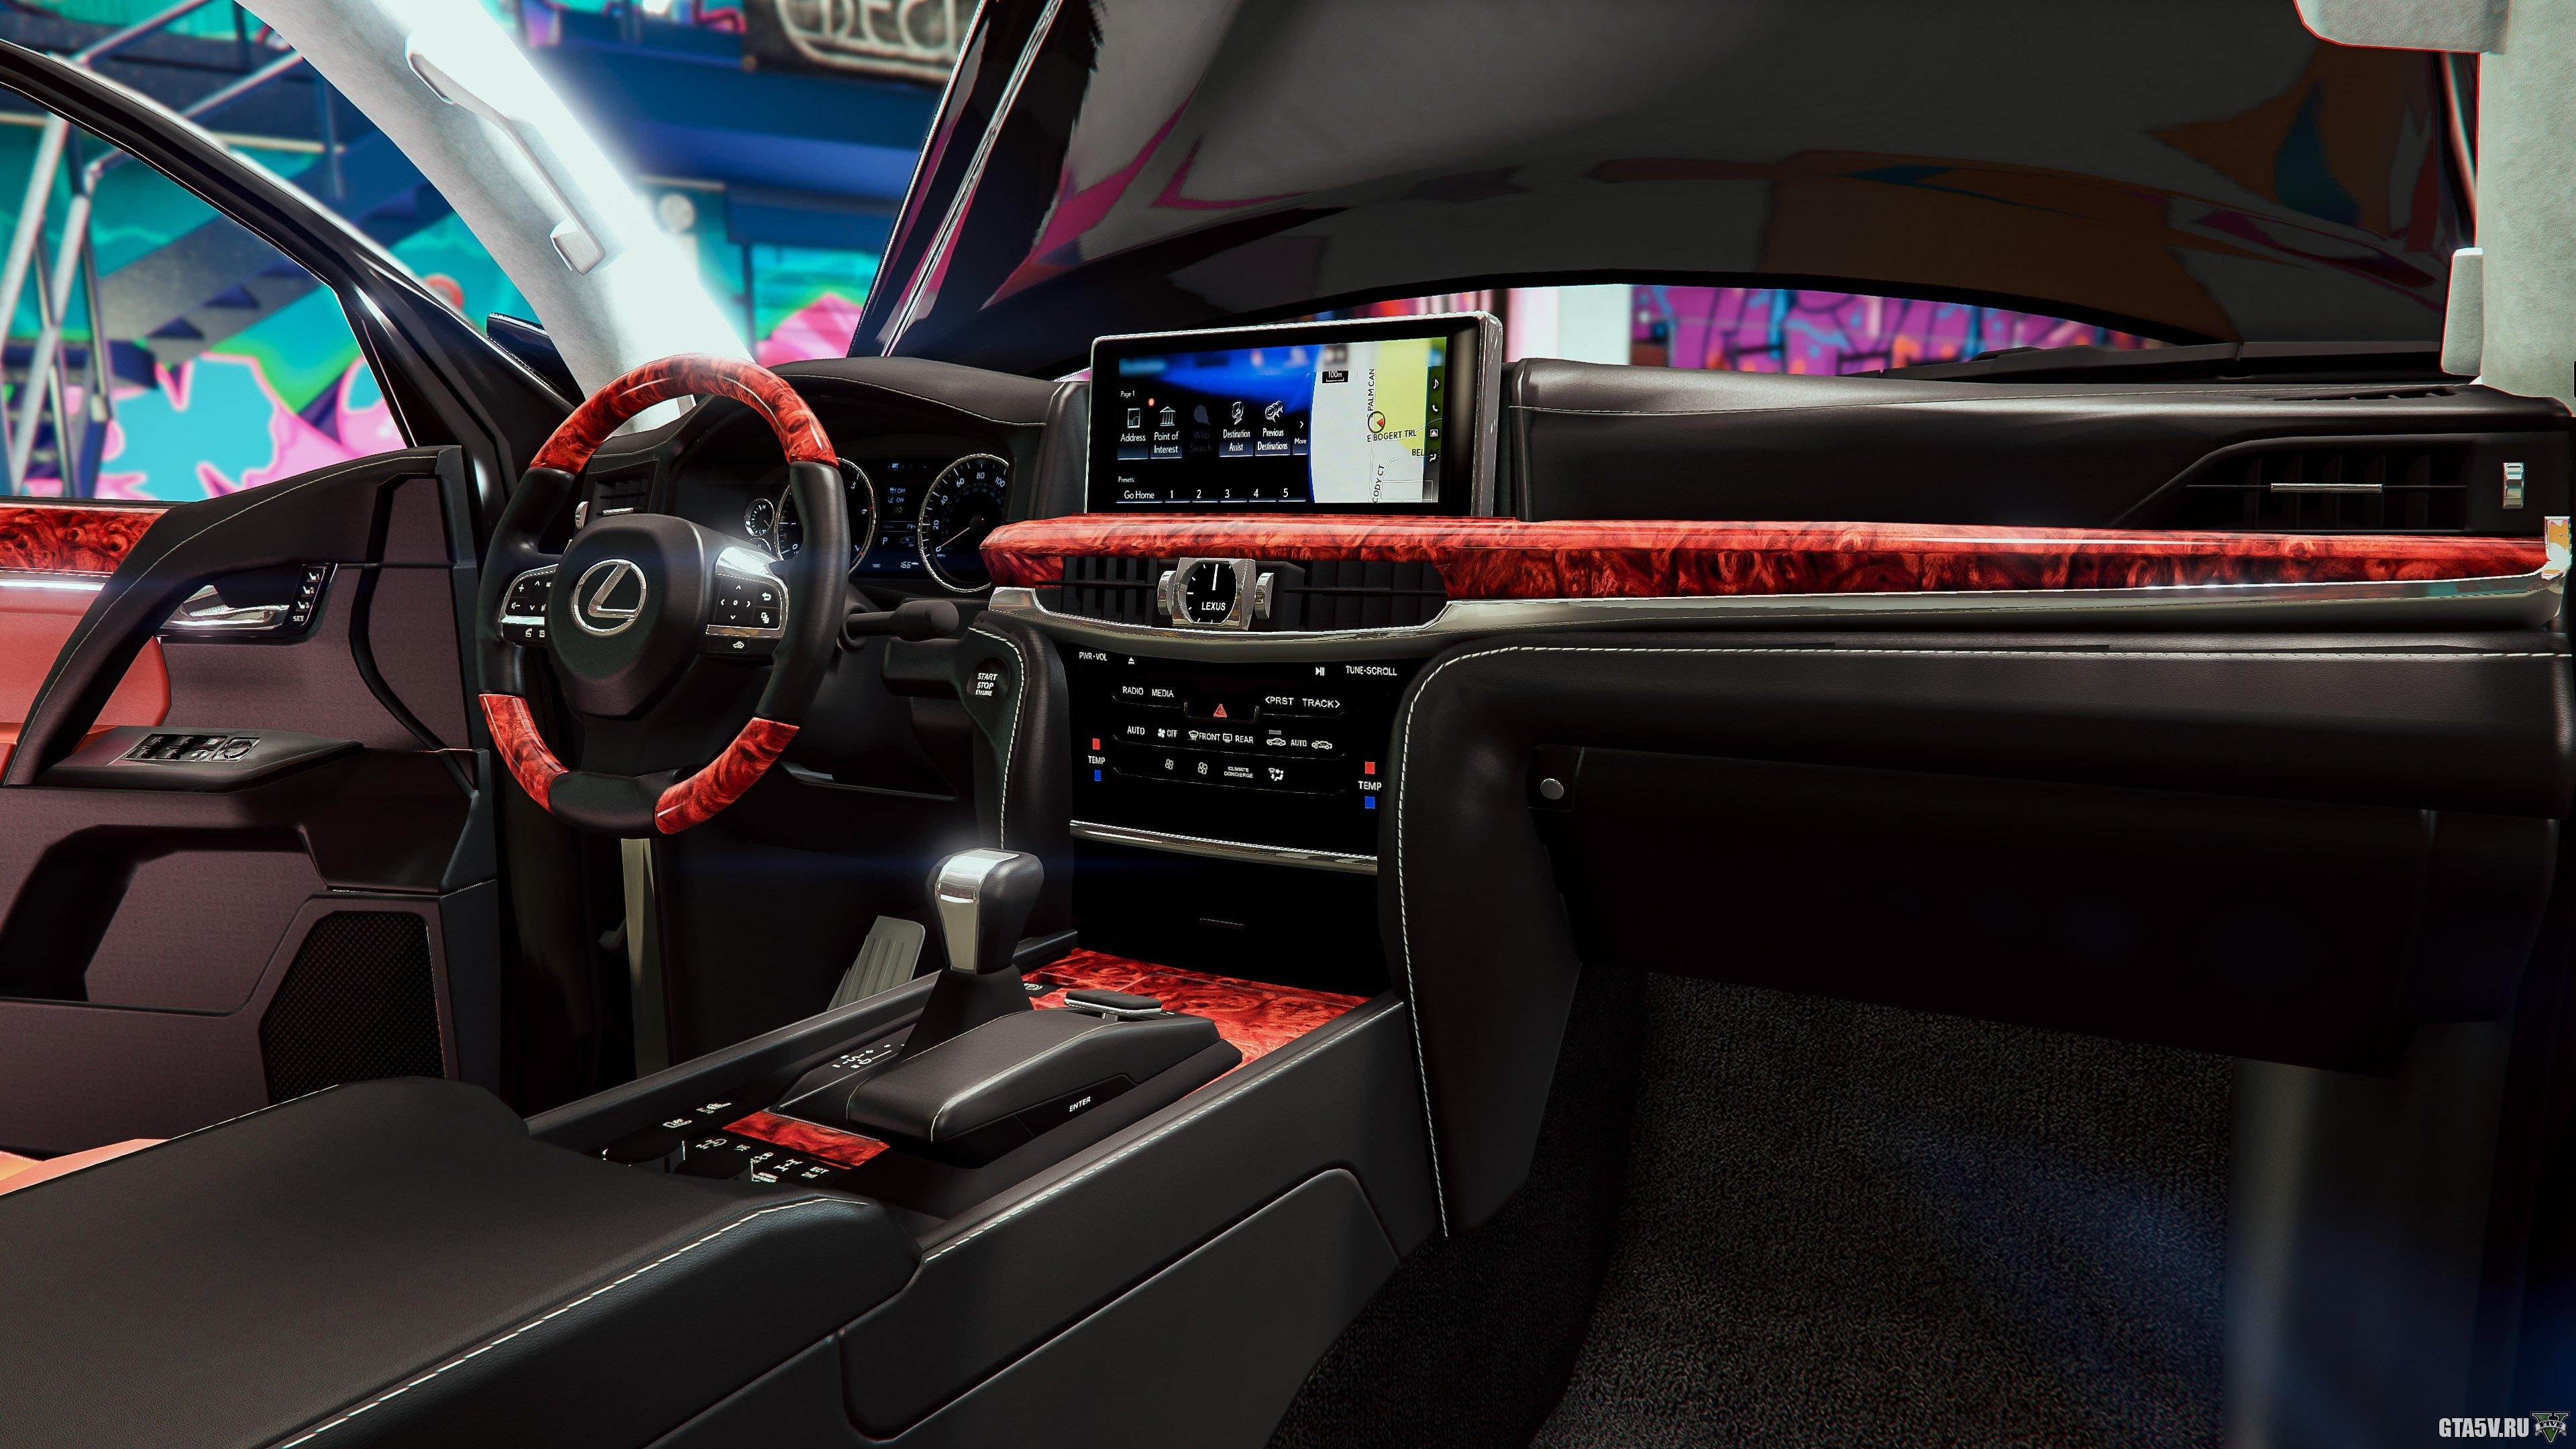 Лексус в ГТА 5 — мод Lexus LX 570 2018